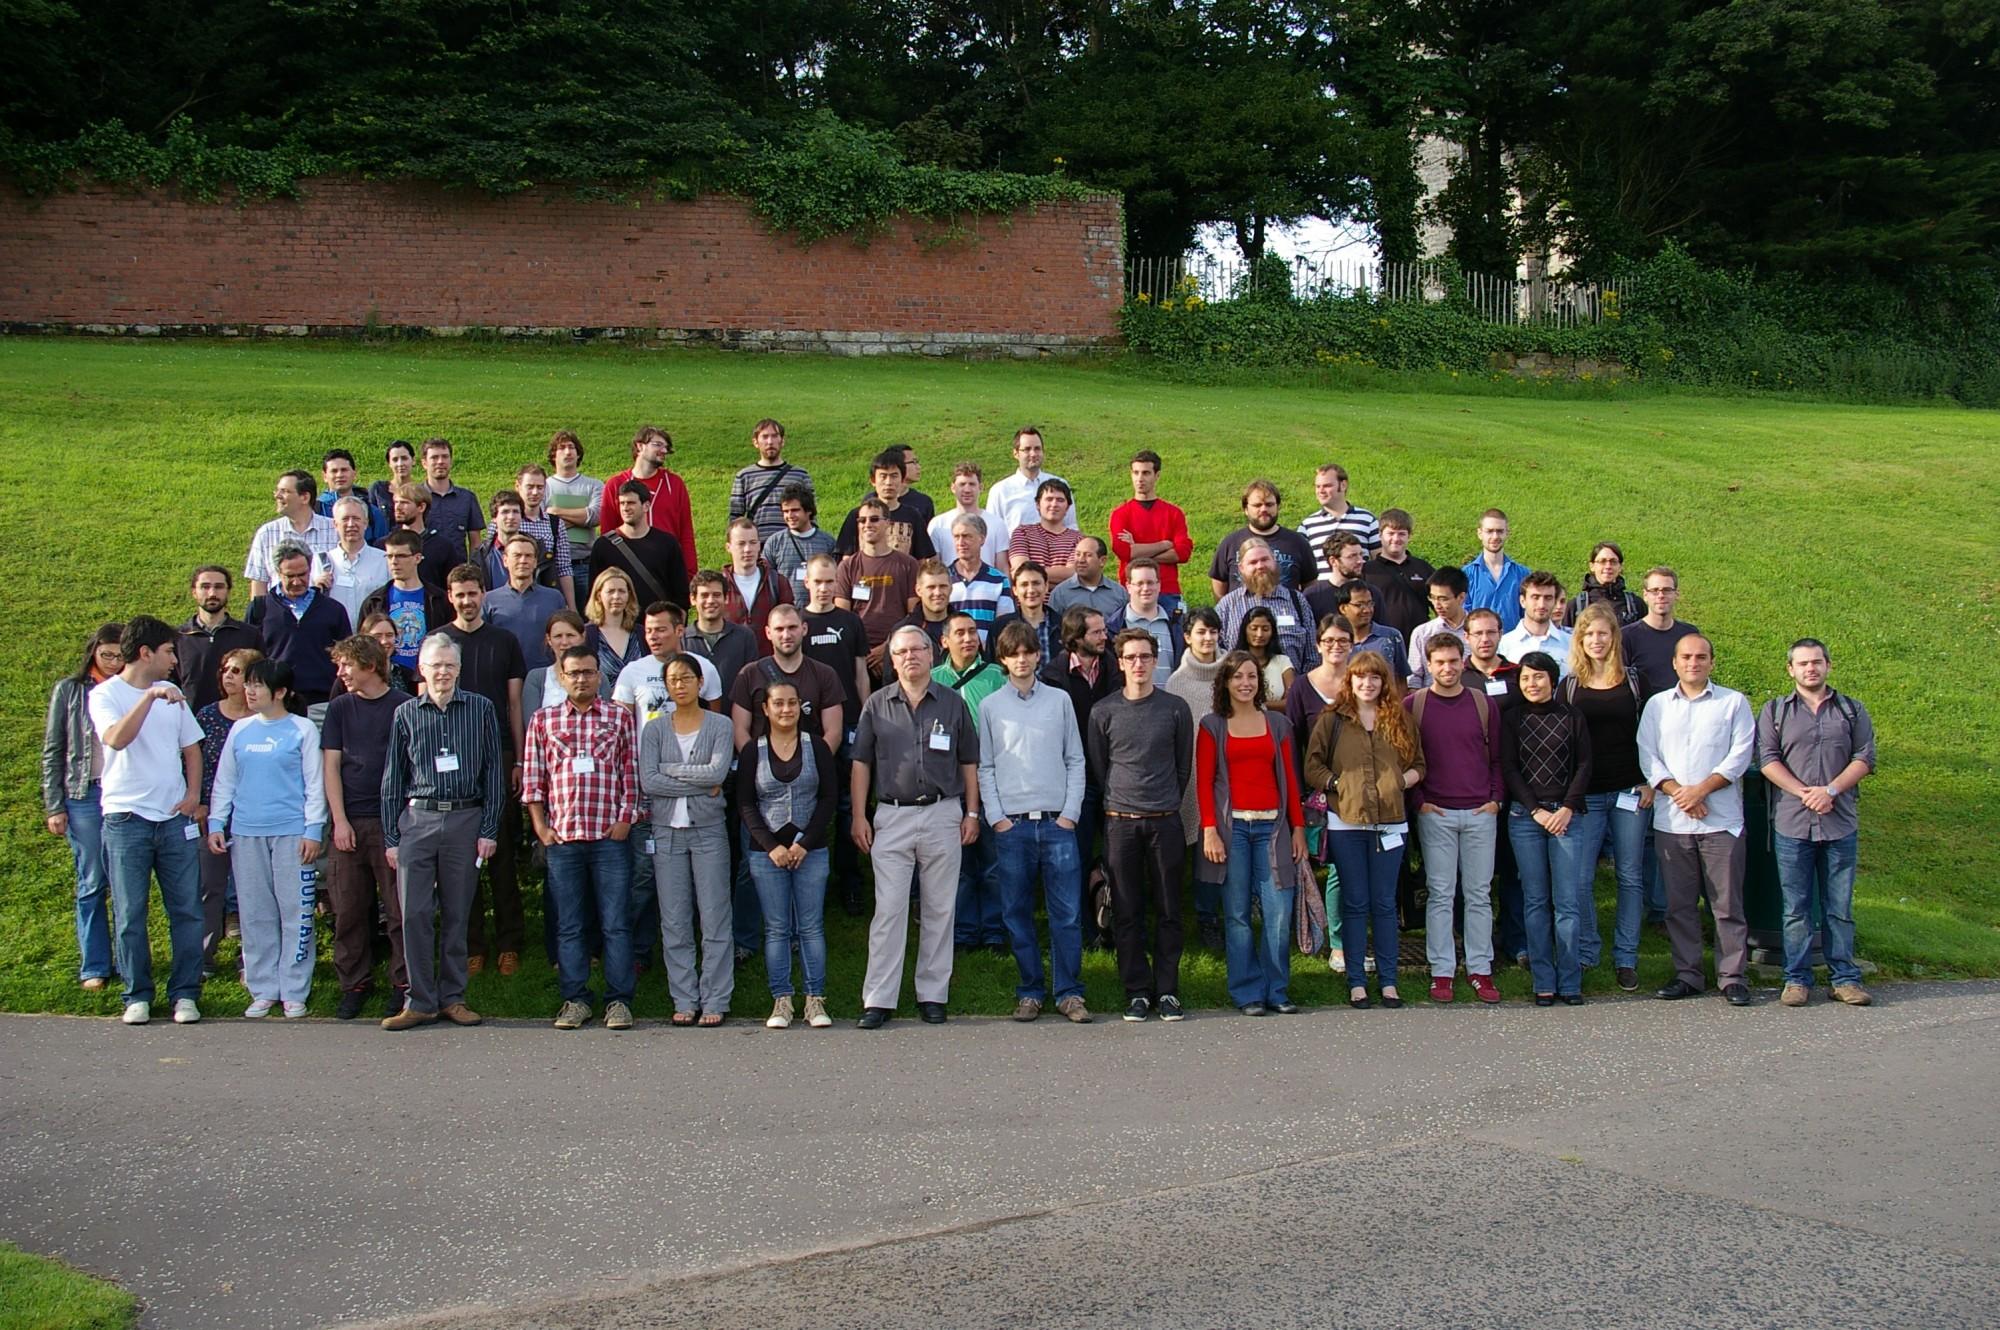 SUSSP69 Group Photograph No. 1 Copyright Alan Walker, University of Edinburgh.